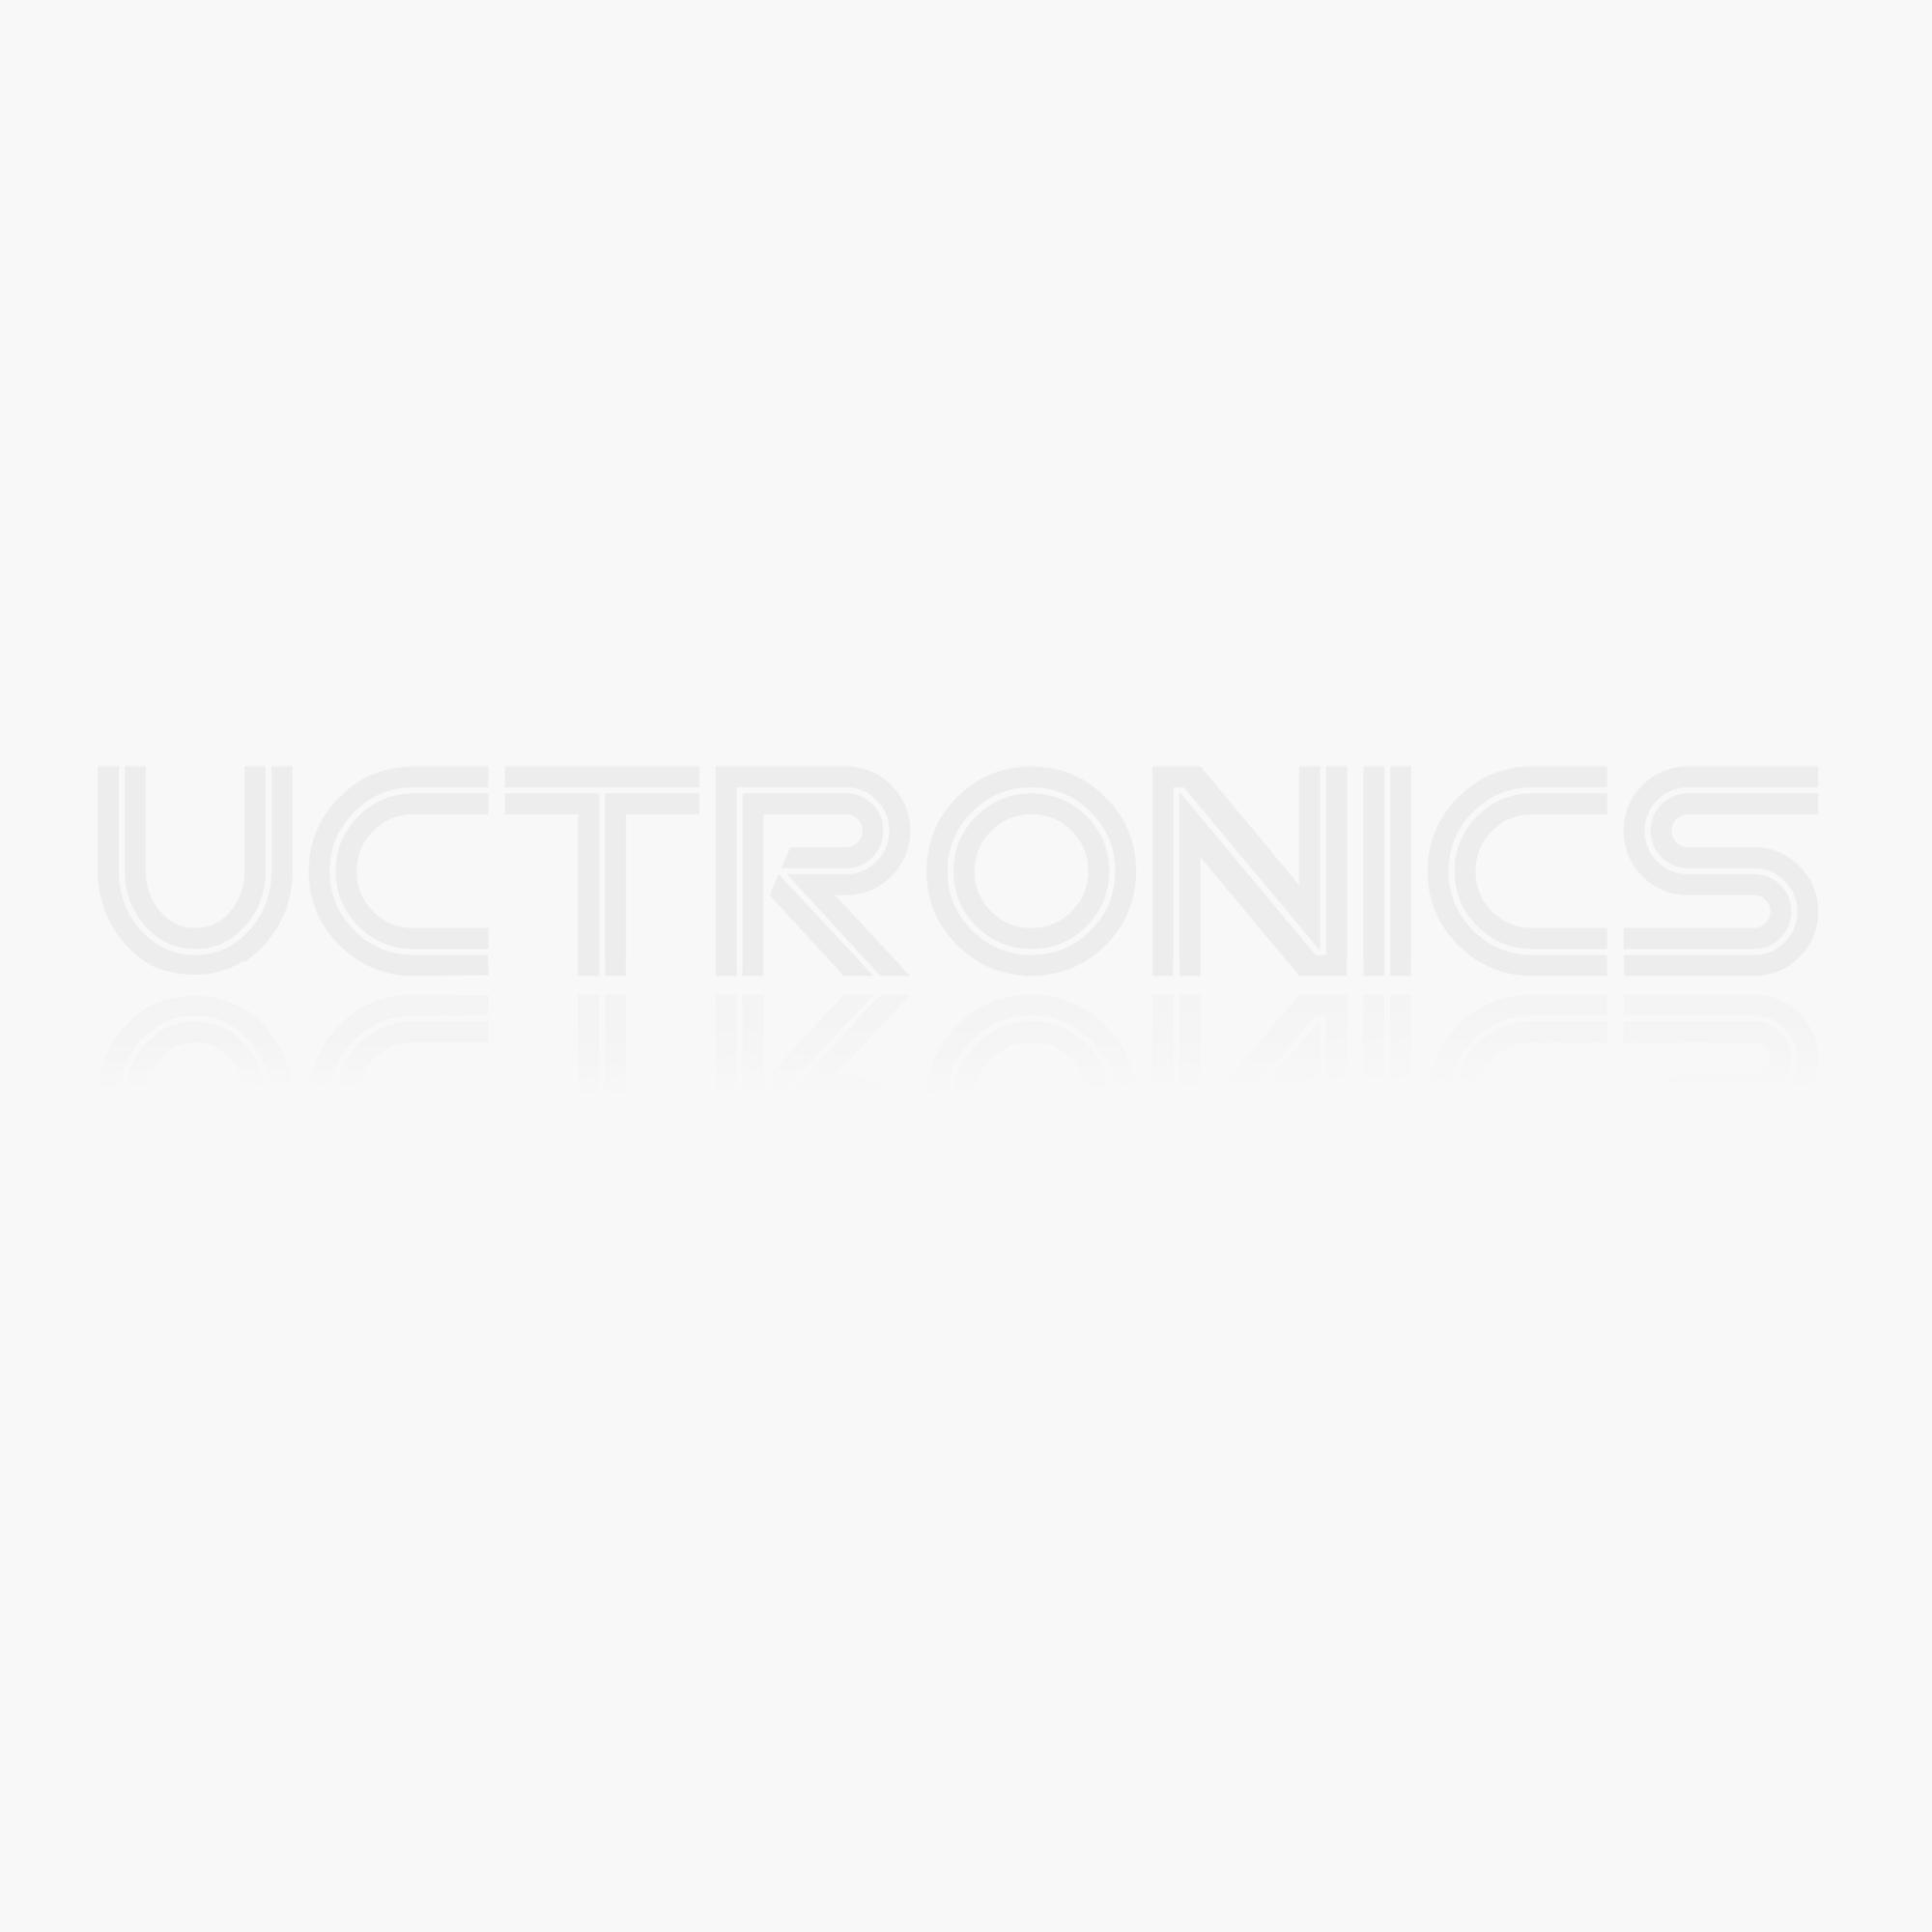 USB ISP Programmer for ATMEL AVR ( 51 ATMega ATTiny )